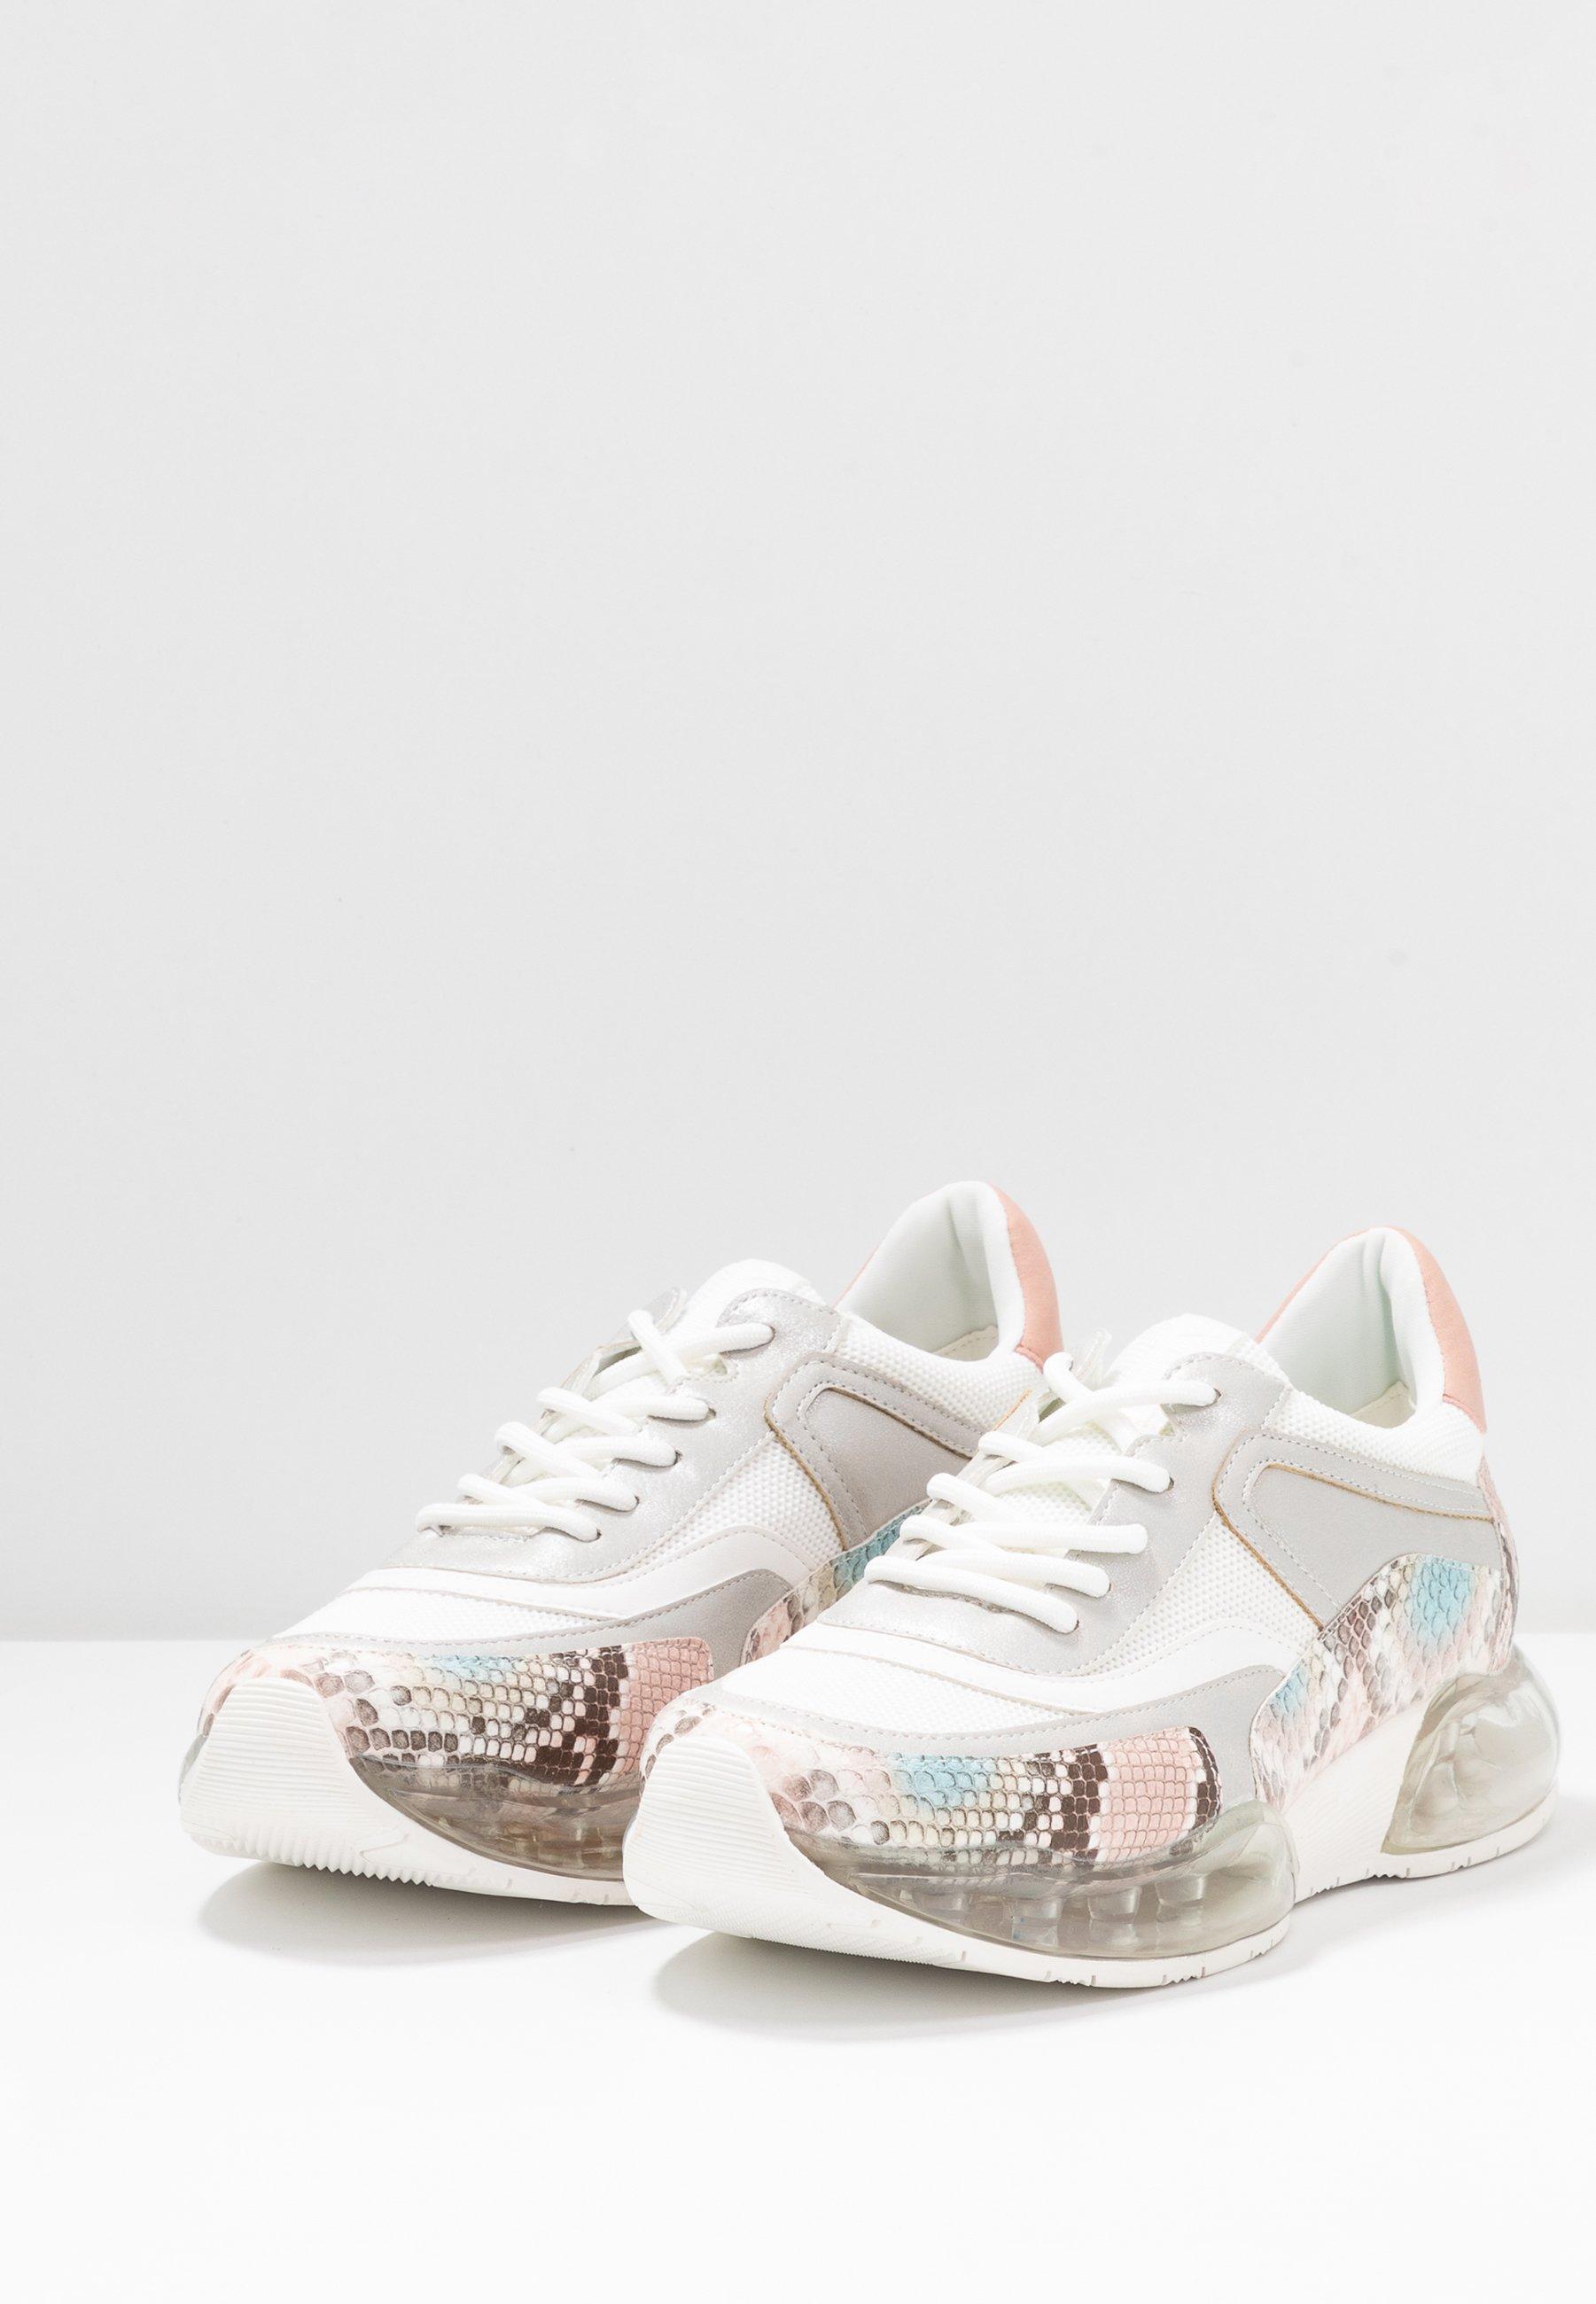 BLAKE Sneakers whiteblushmulticolor